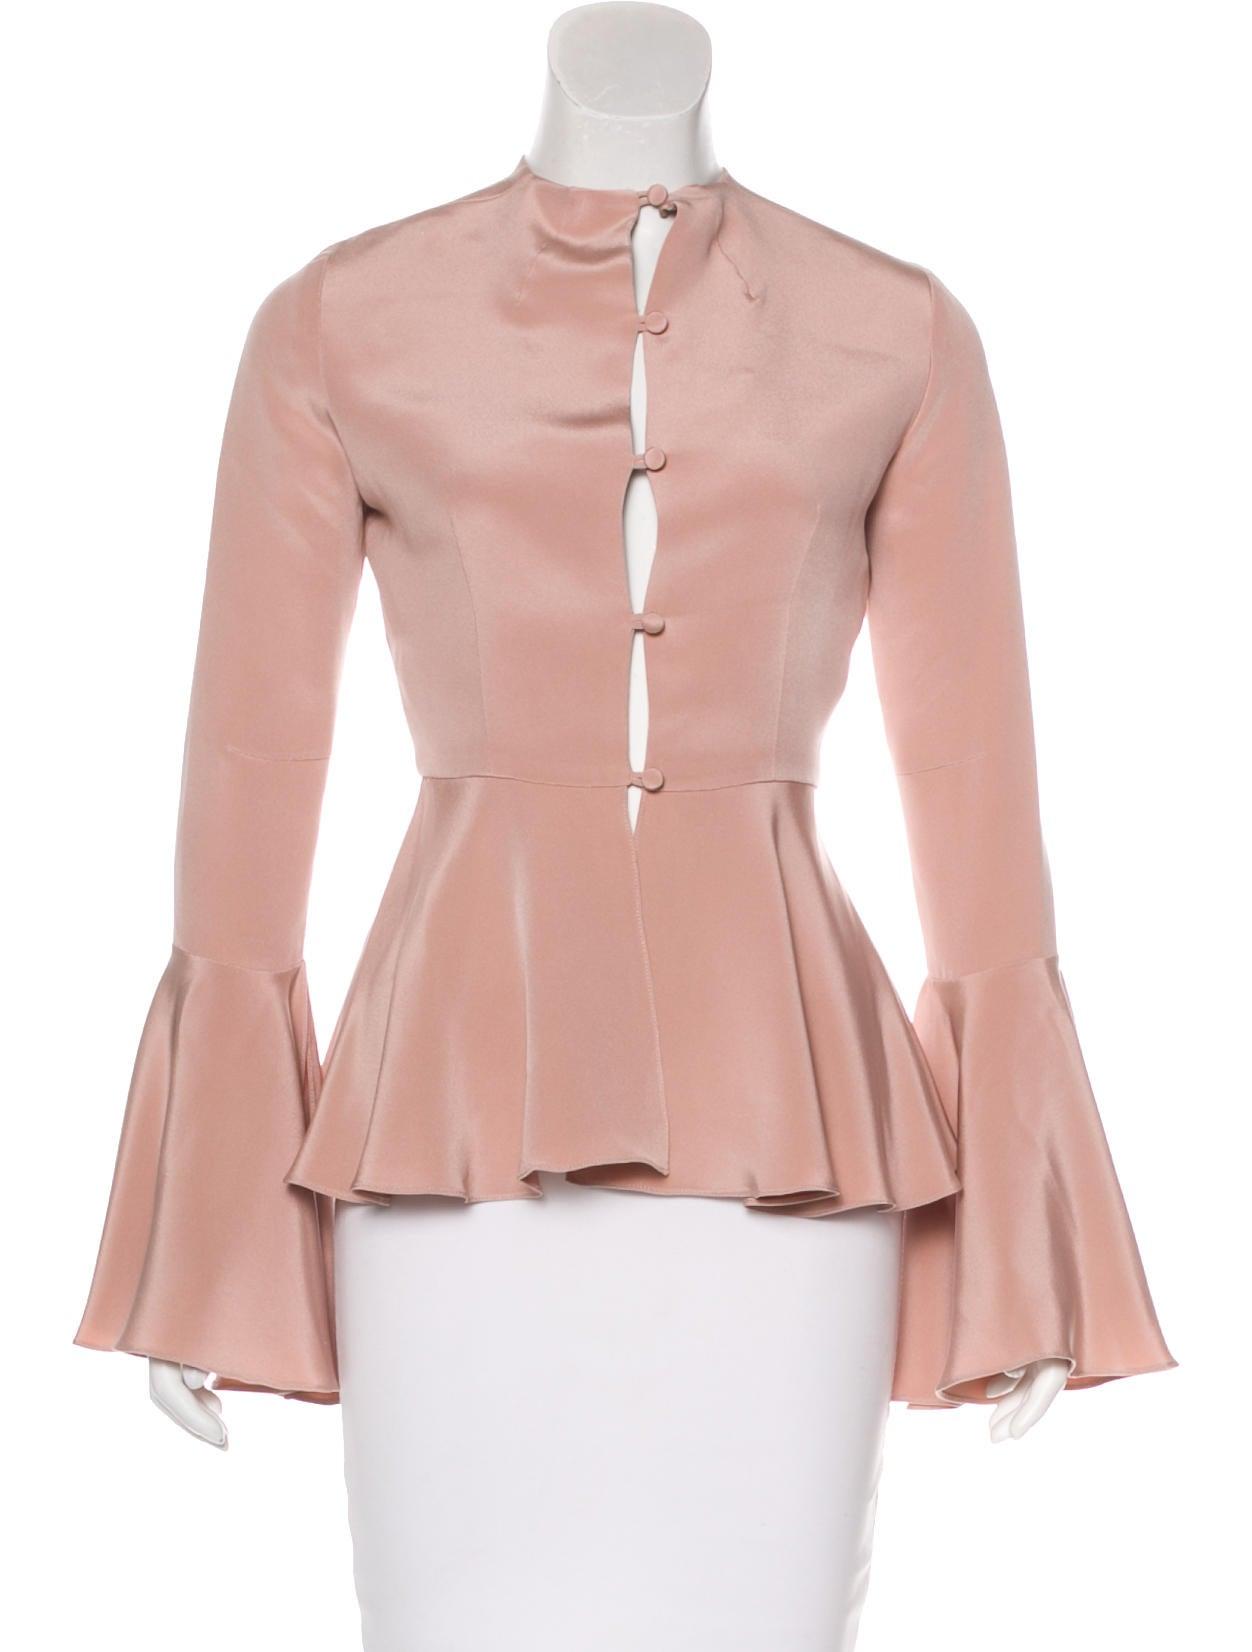 Obando Silk Jco20206 Roxy Carlos Juan Crepe Blouse Clothing byI67Ygfv